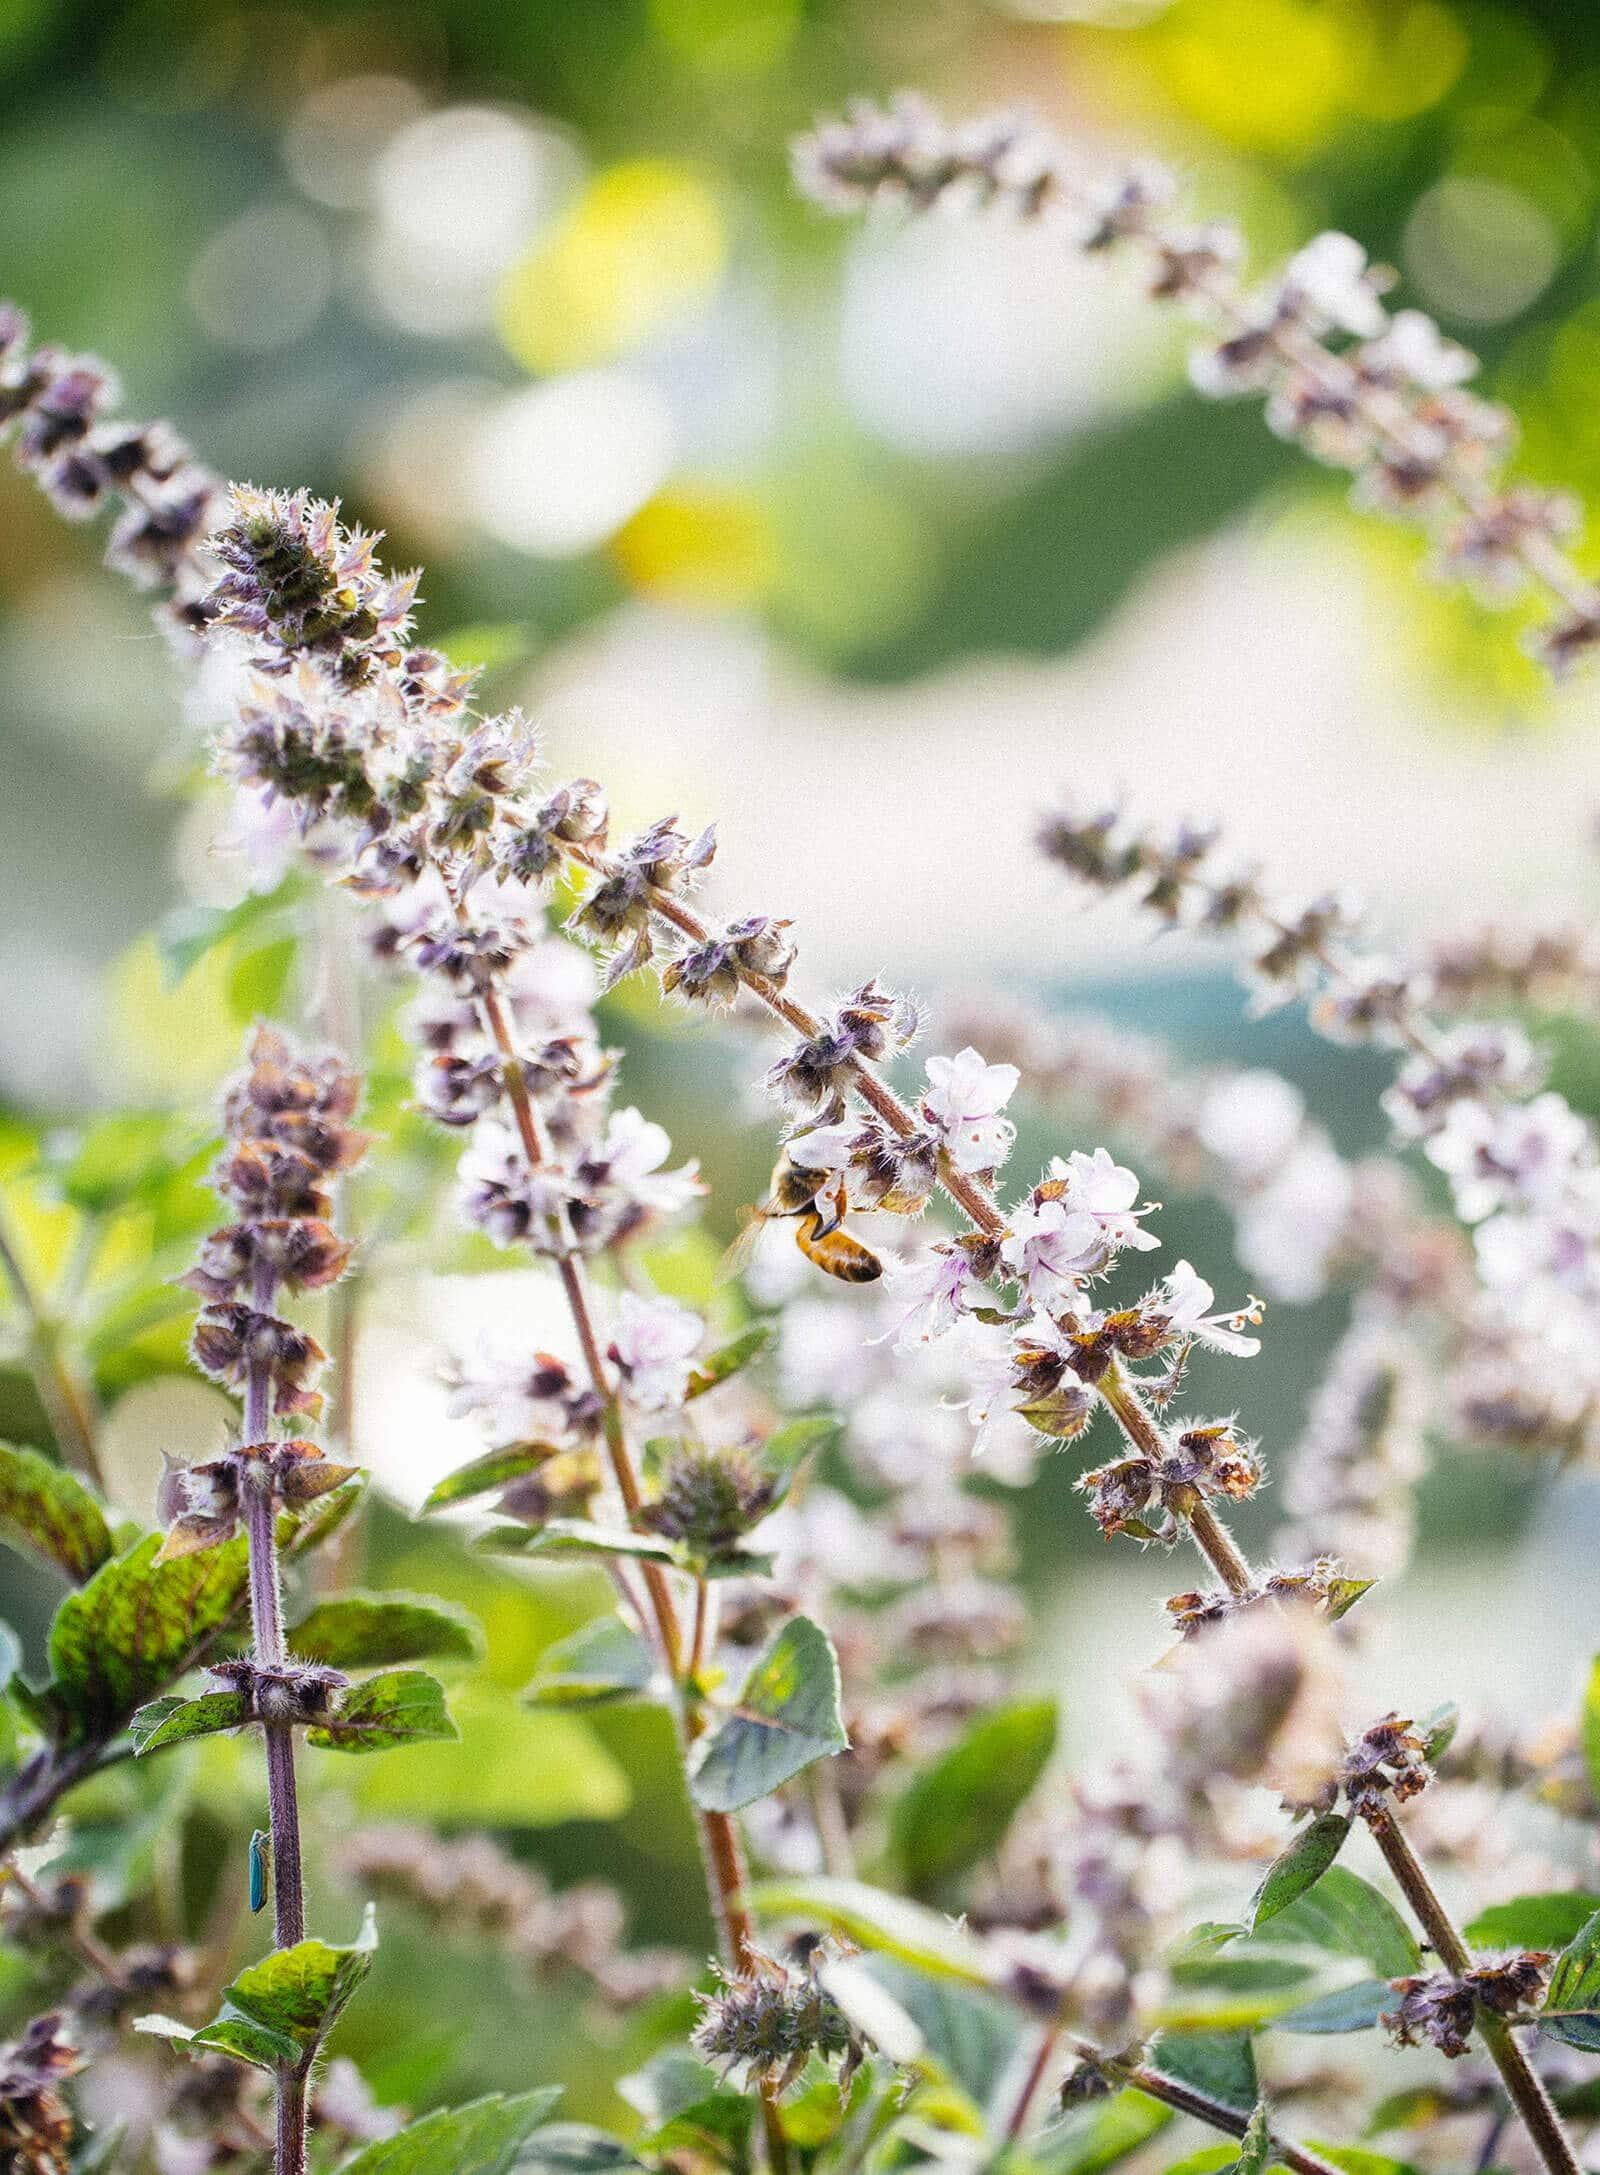 A bee feeding on basil flowers in the garden